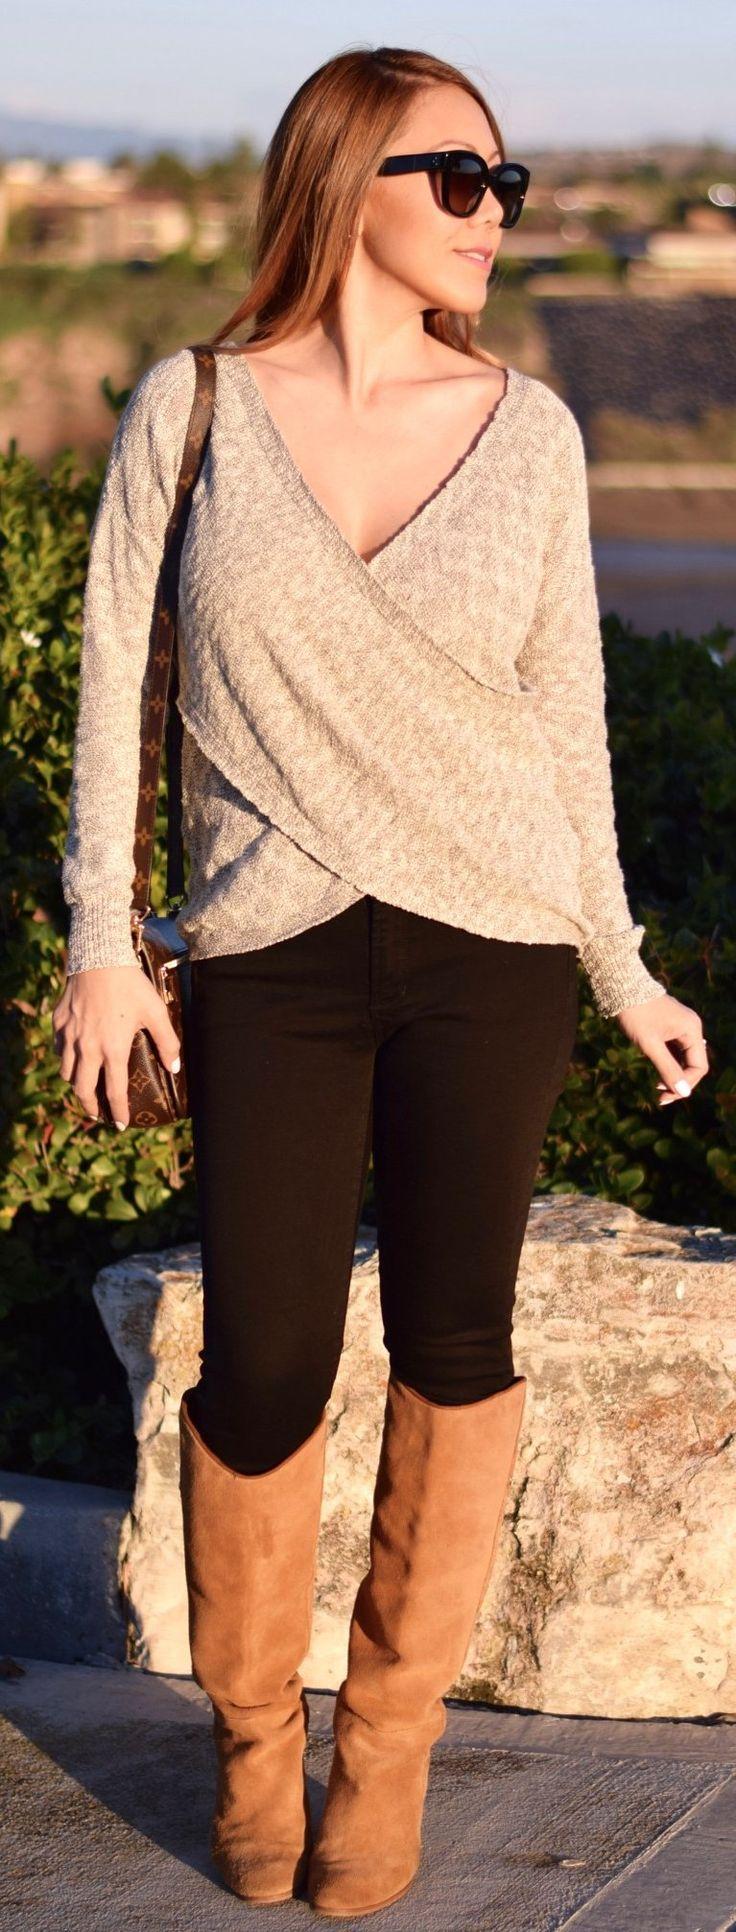 Beige Wrap Knit / Black Skinny Jeans / Brown Boots Source